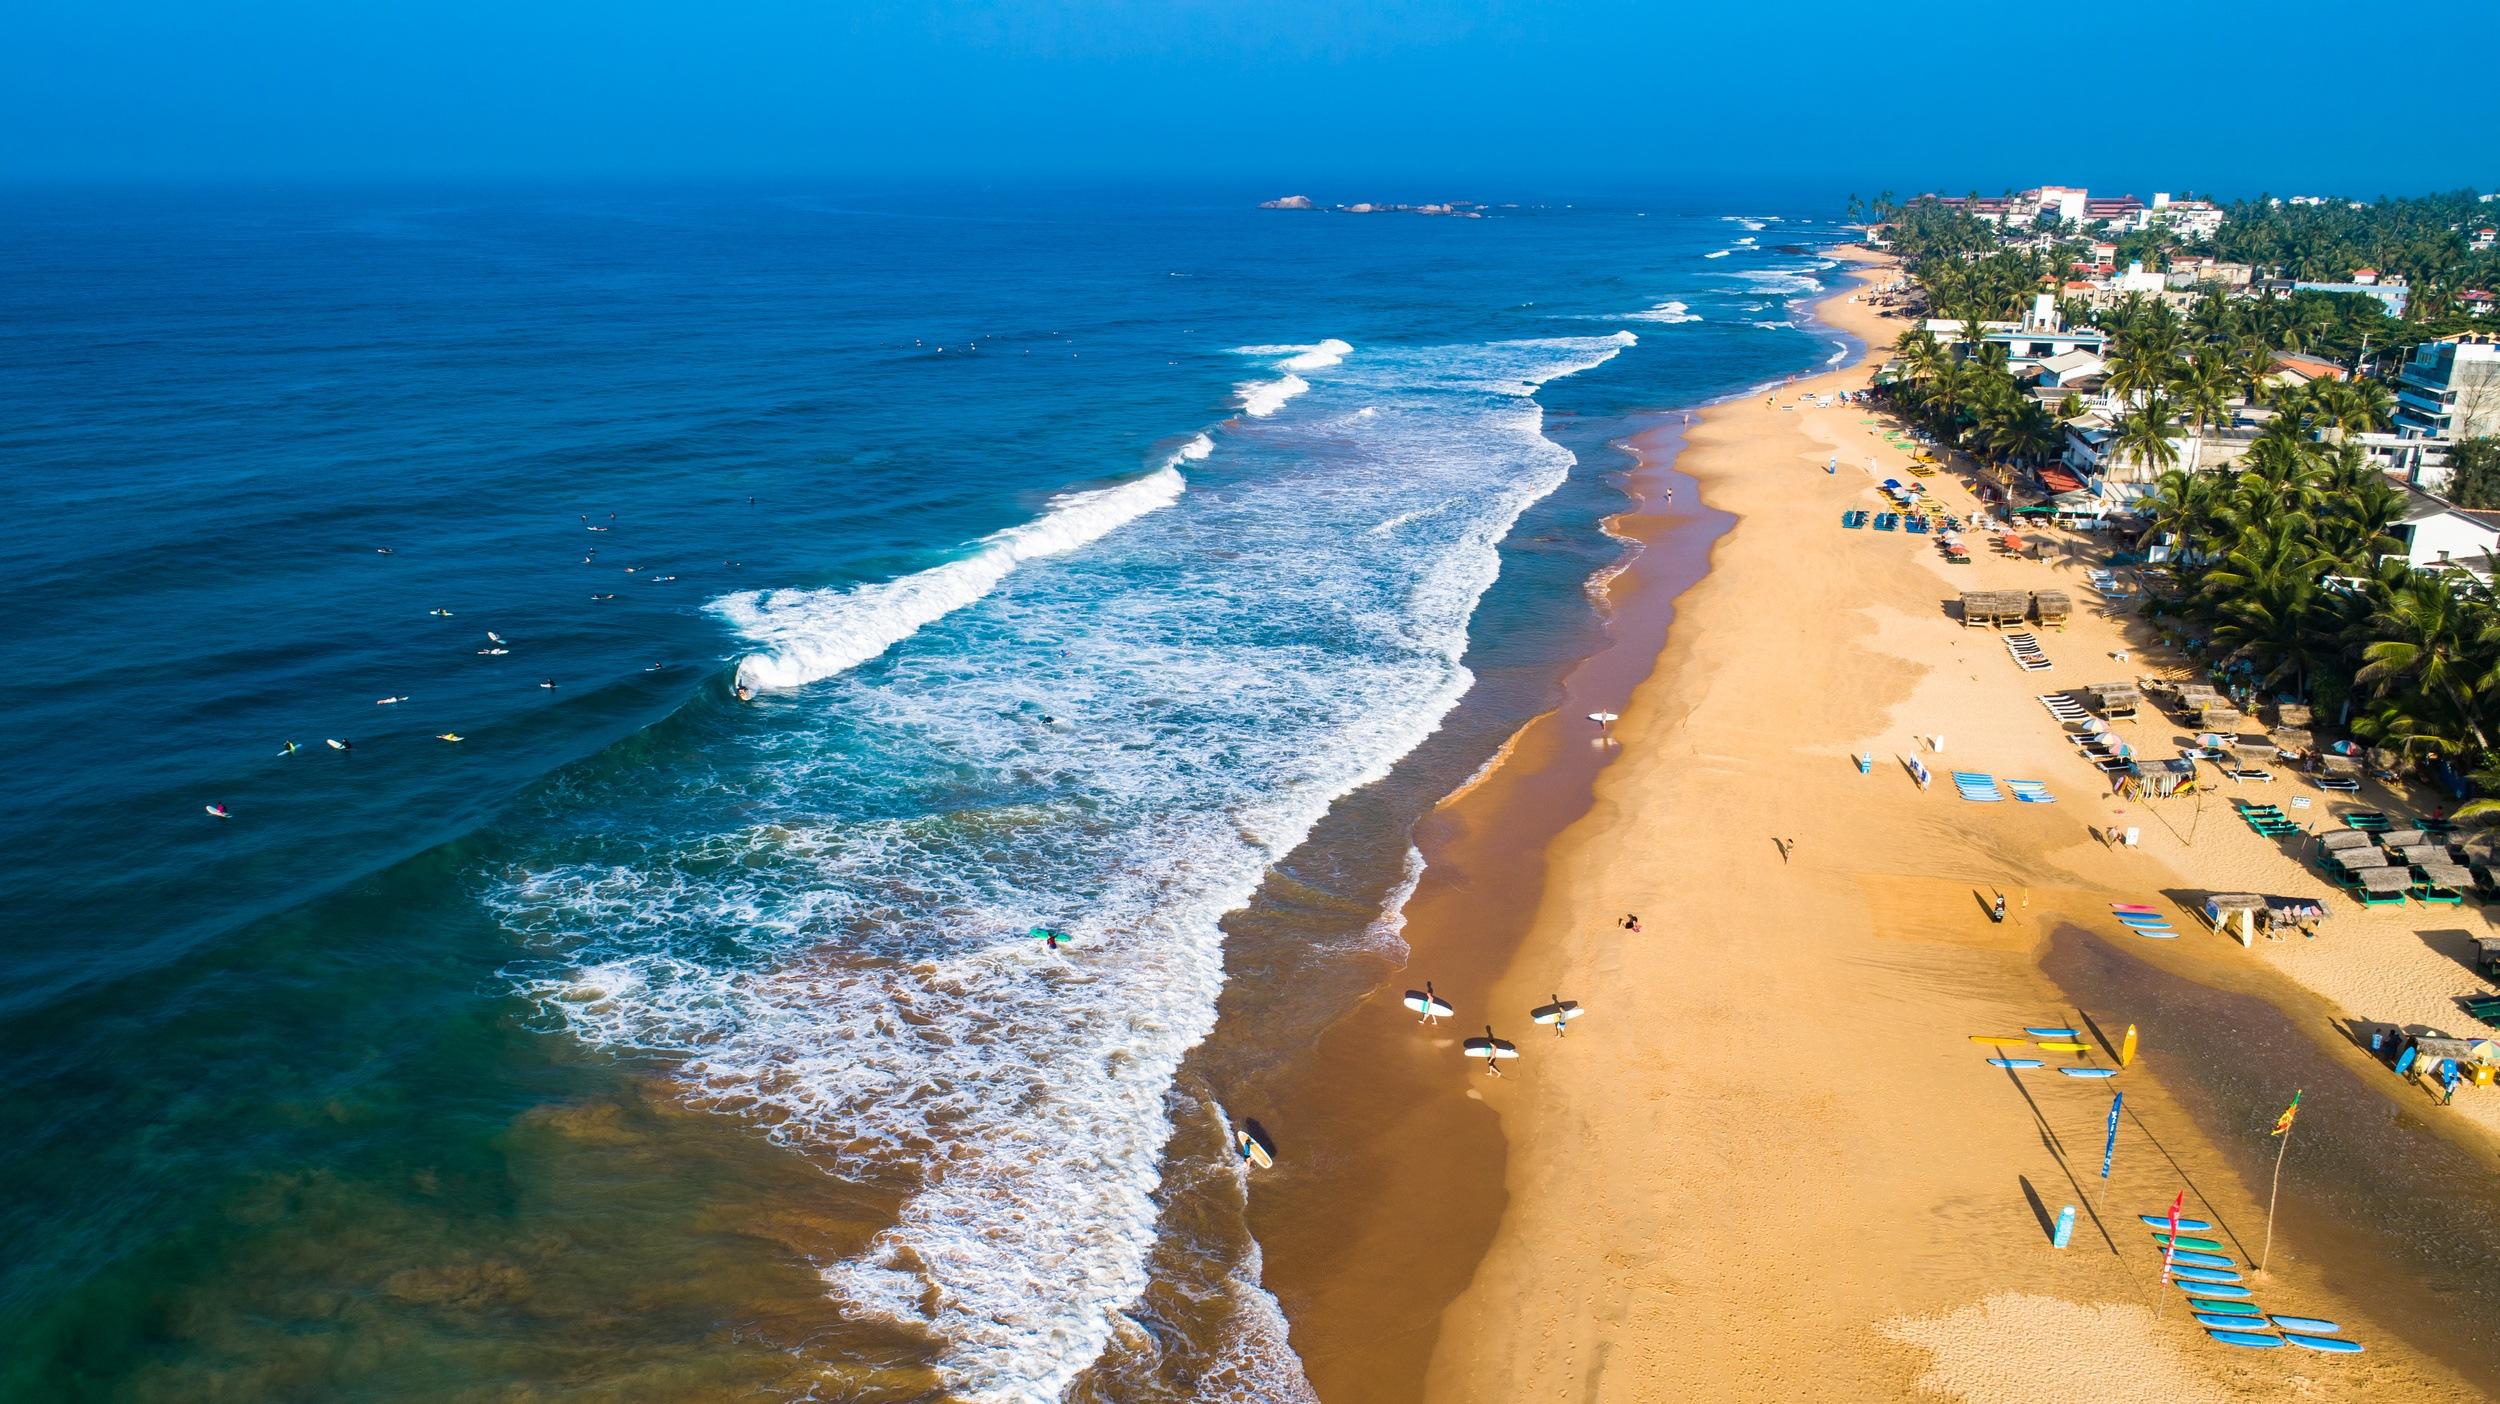 Hikkaduwa beach. Sri Lanka.